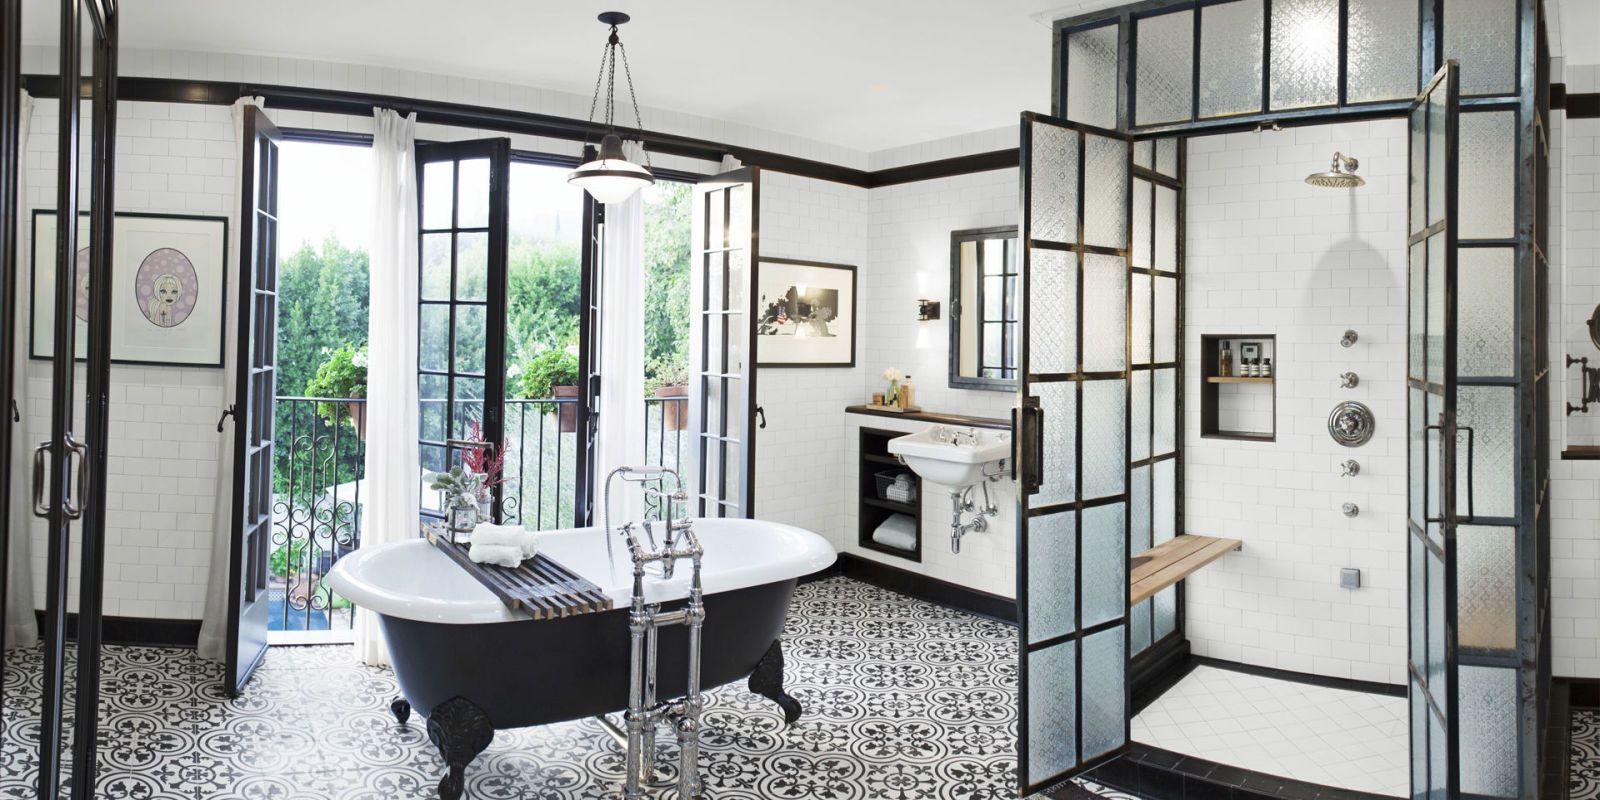 Industrial chic bathroom & Best Interior Design Ideas - Beautiful Home Design Inspiration